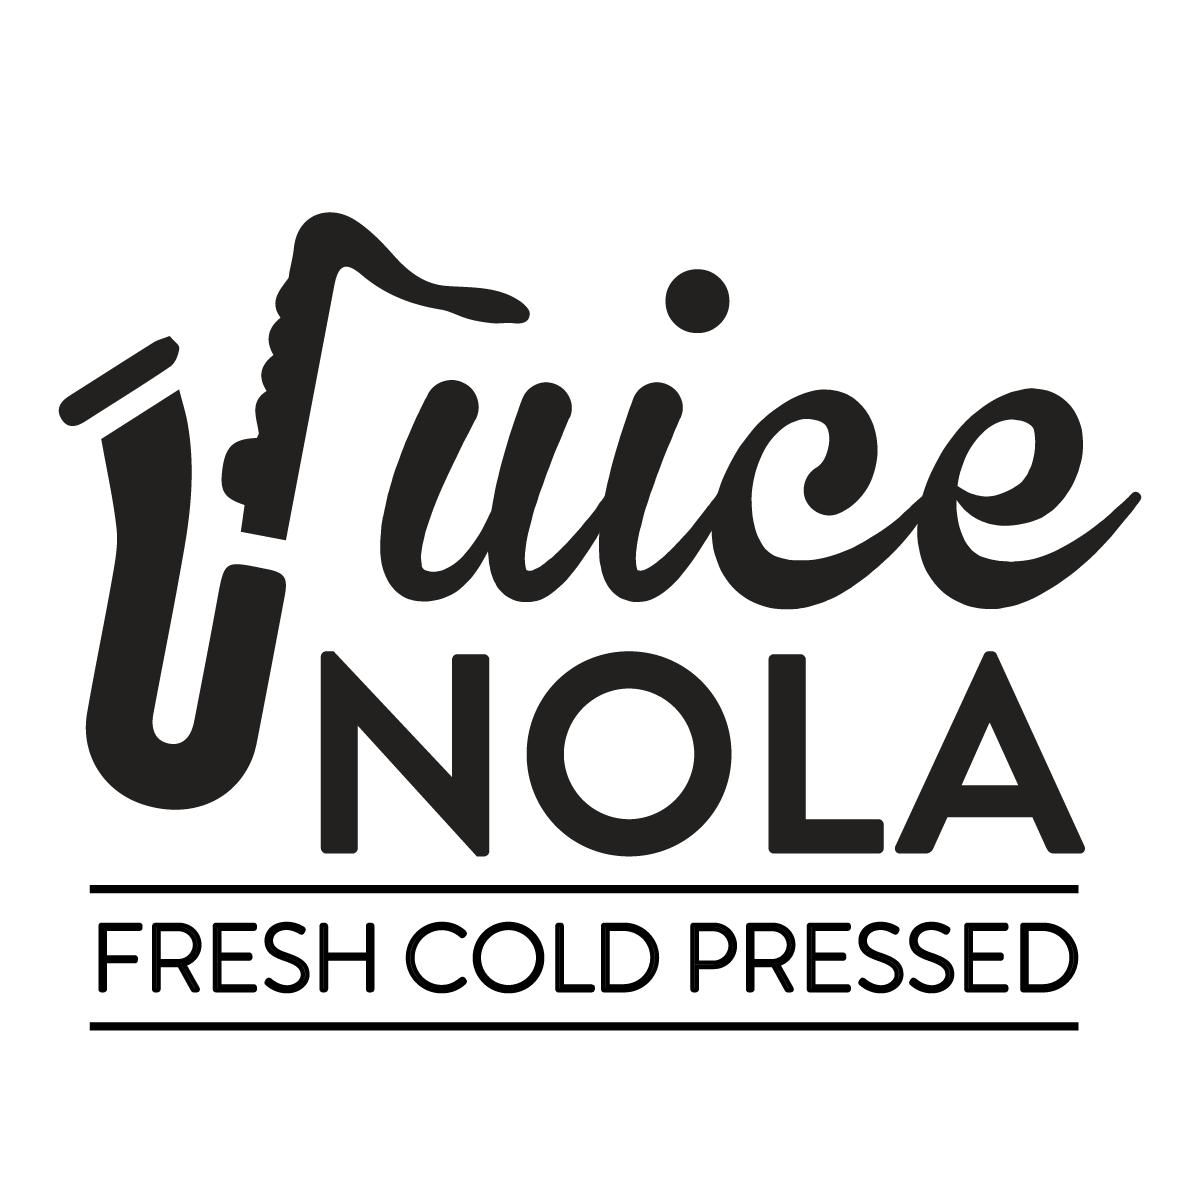 Juice NOLA